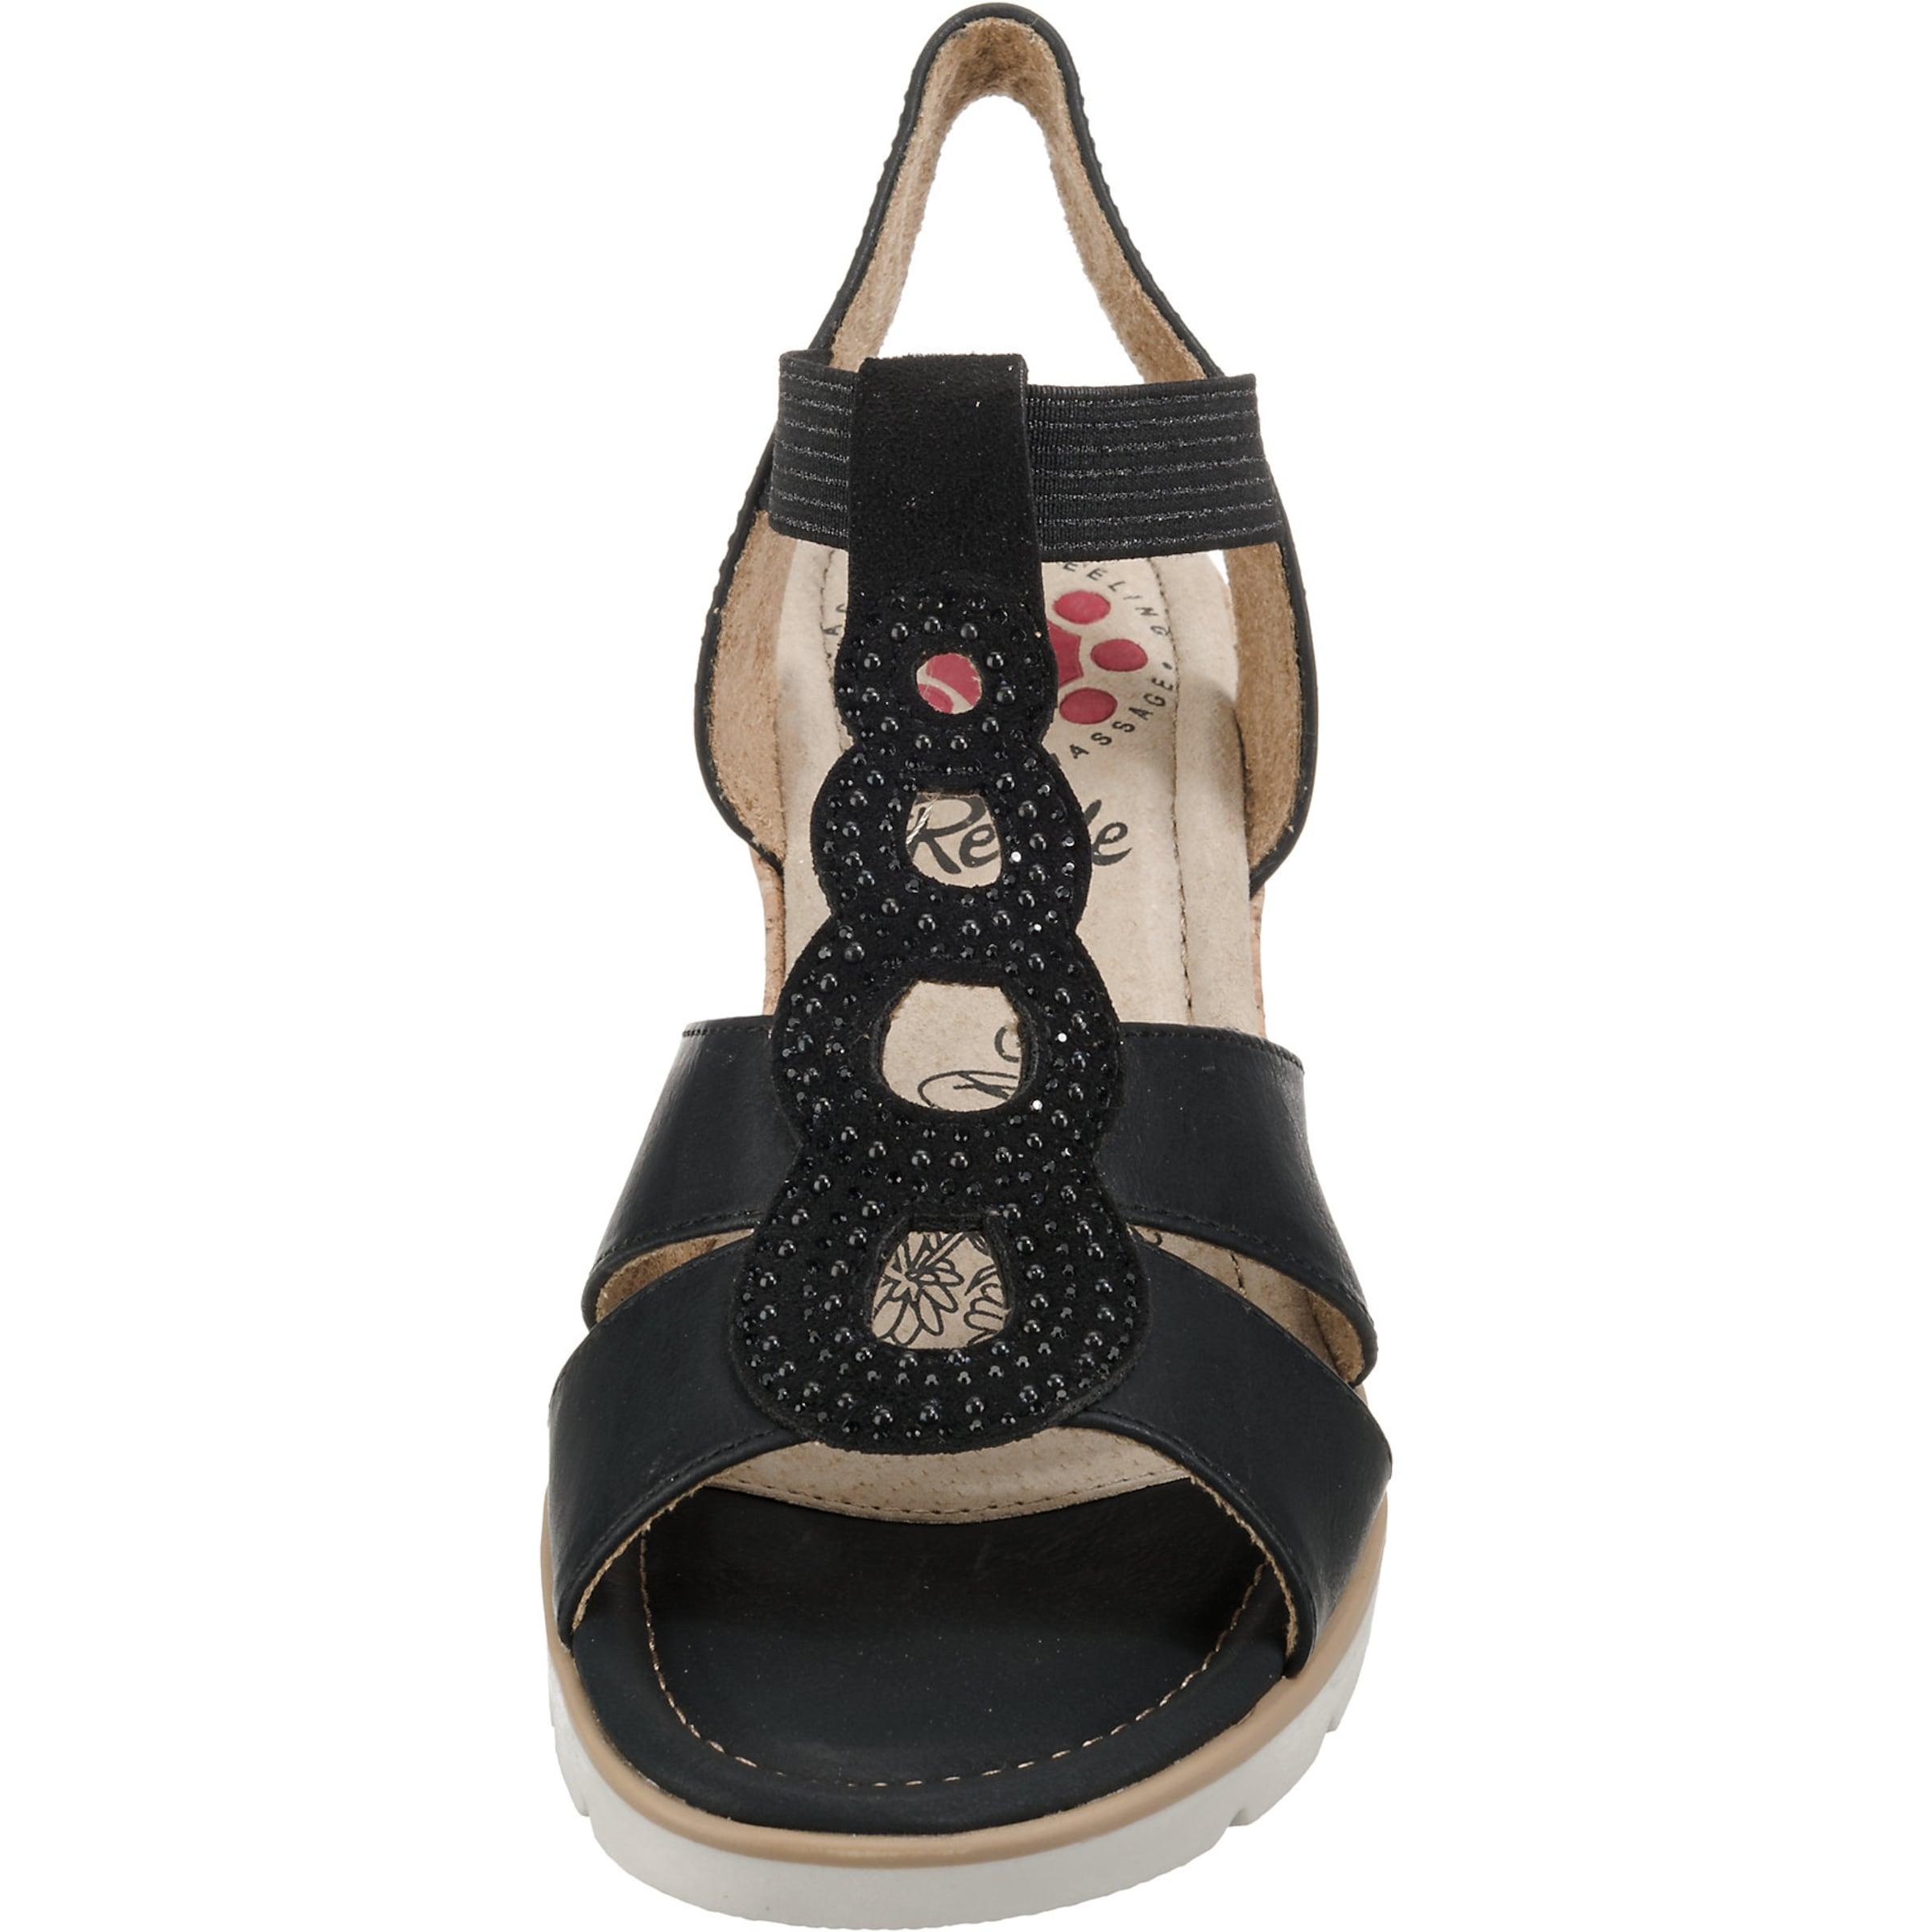 Relife Schwarz Sandalette In In Relife Relife Sandalette Schwarz Sandalette CdhstQr